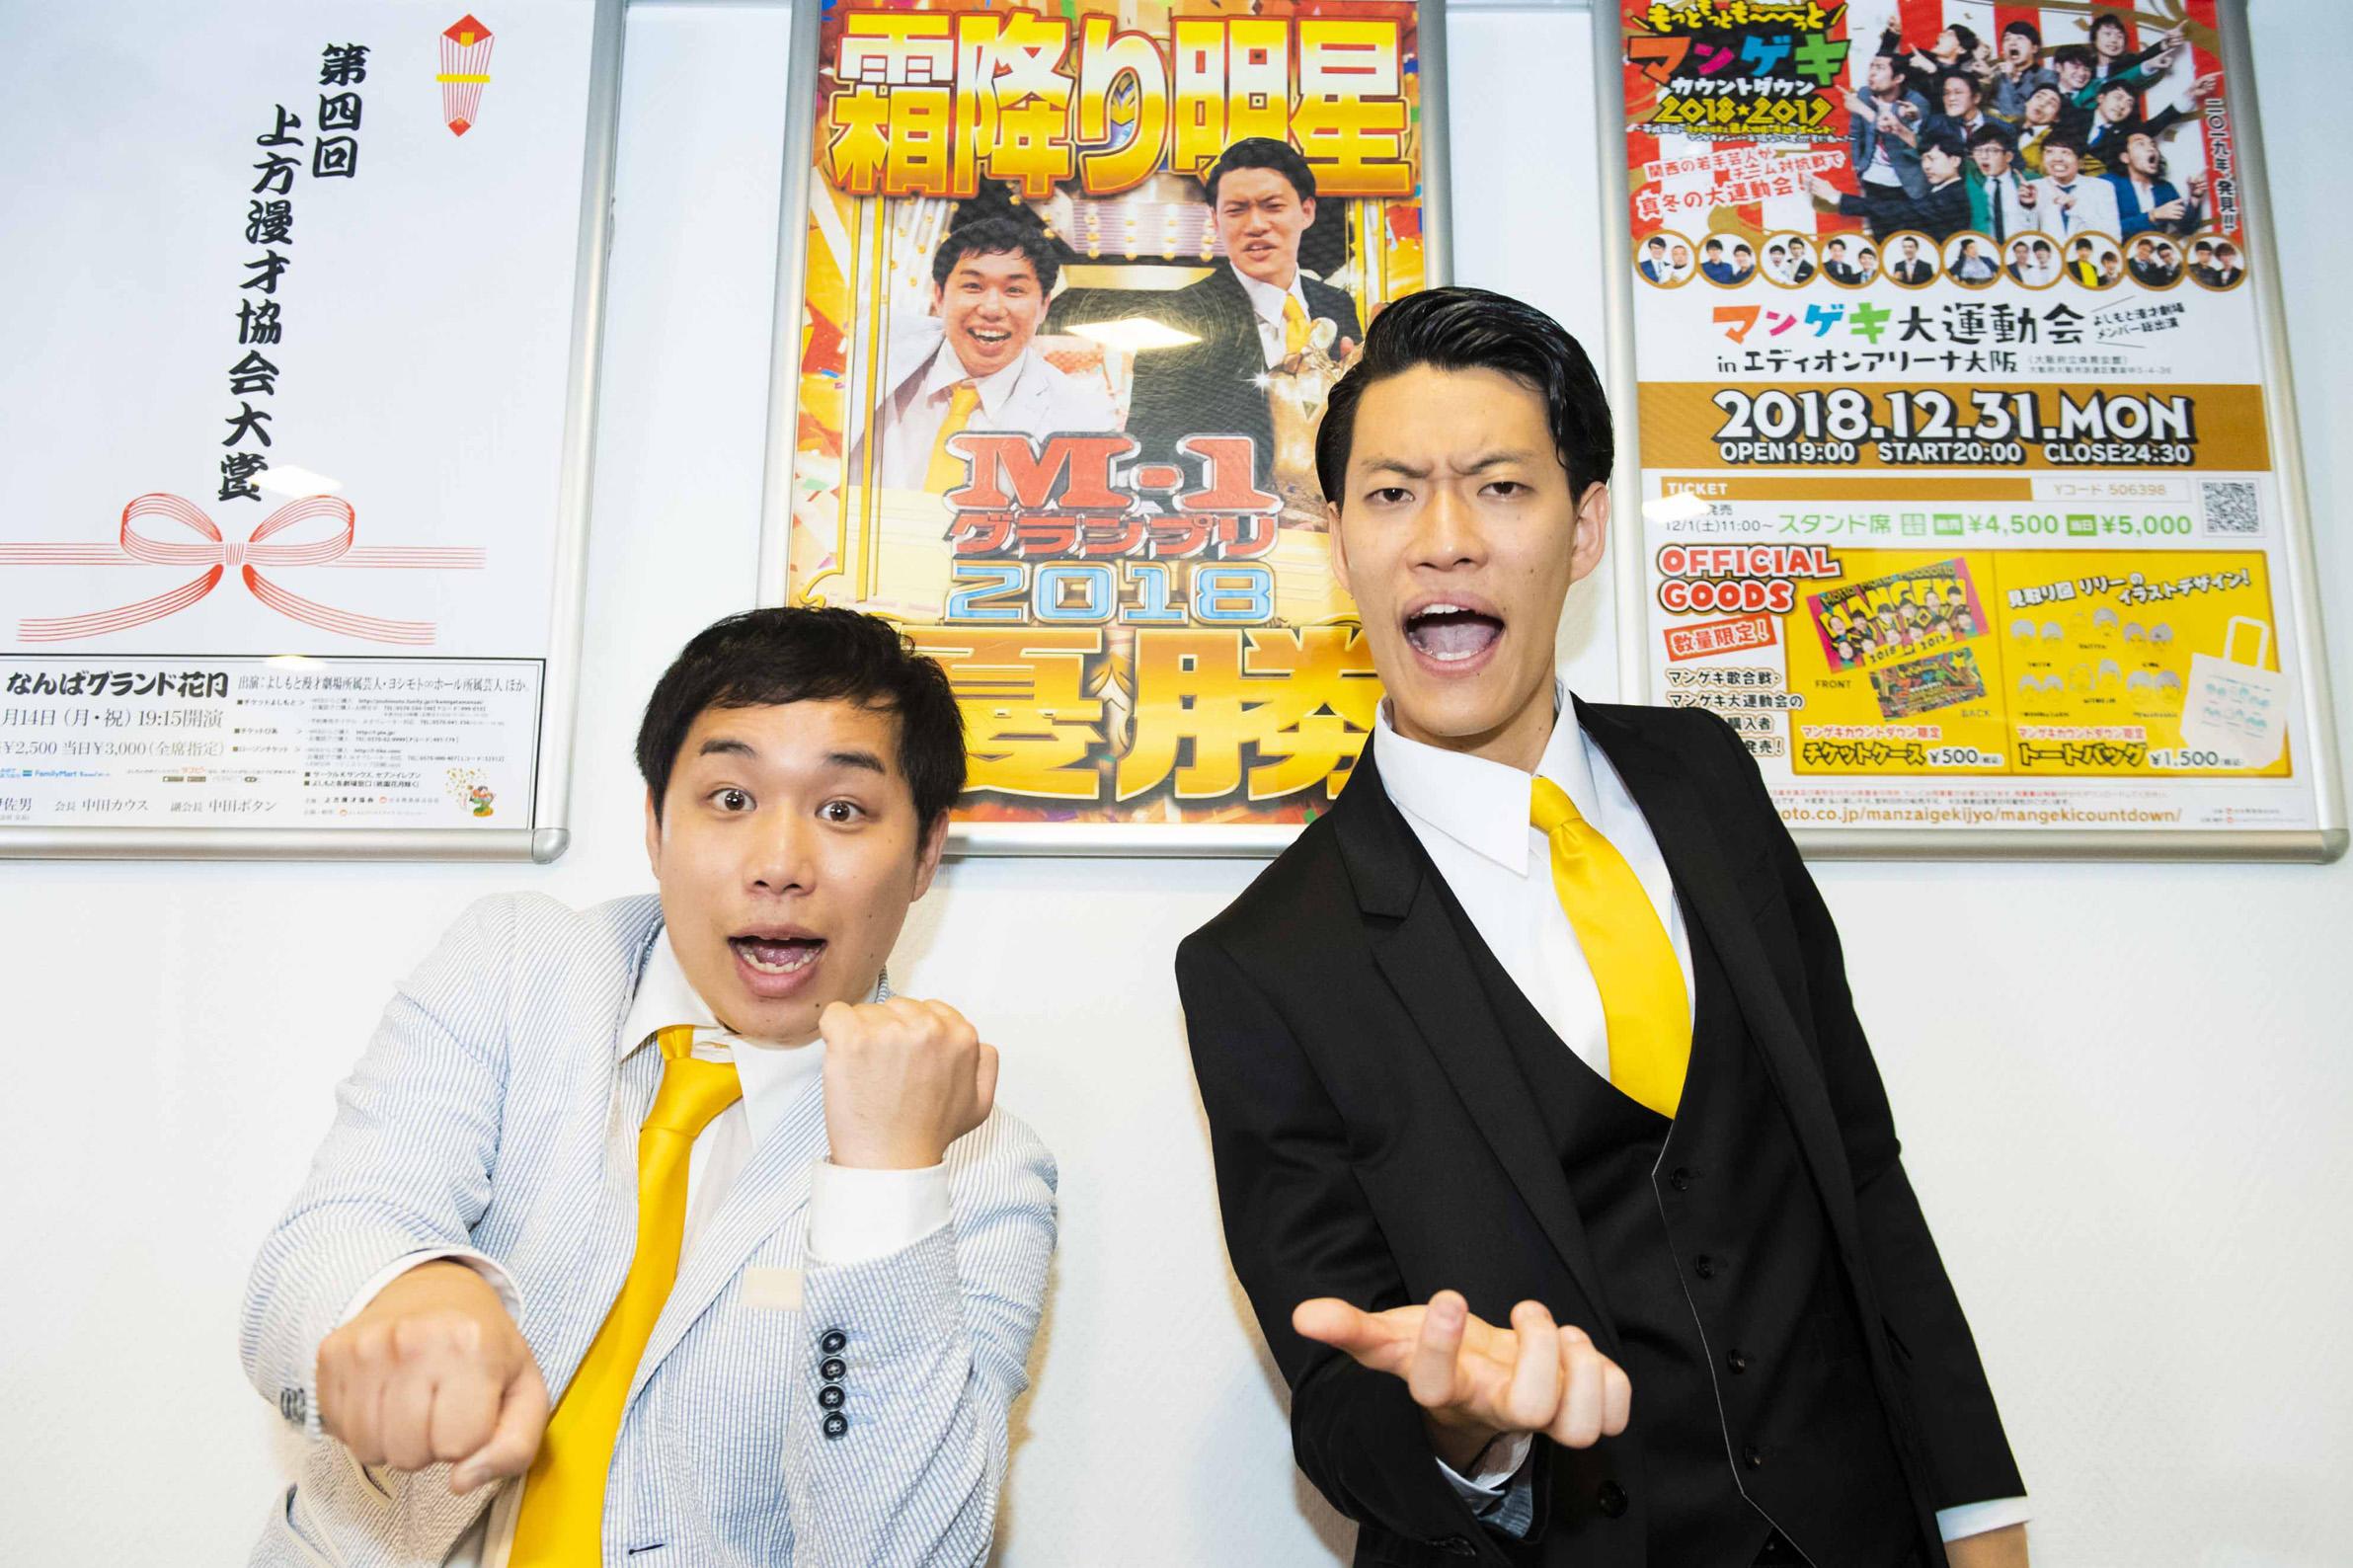 http://news.yoshimoto.co.jp/20181204232709-26a08fd83a3915cec860e12ef797006d9c83b96c.jpg